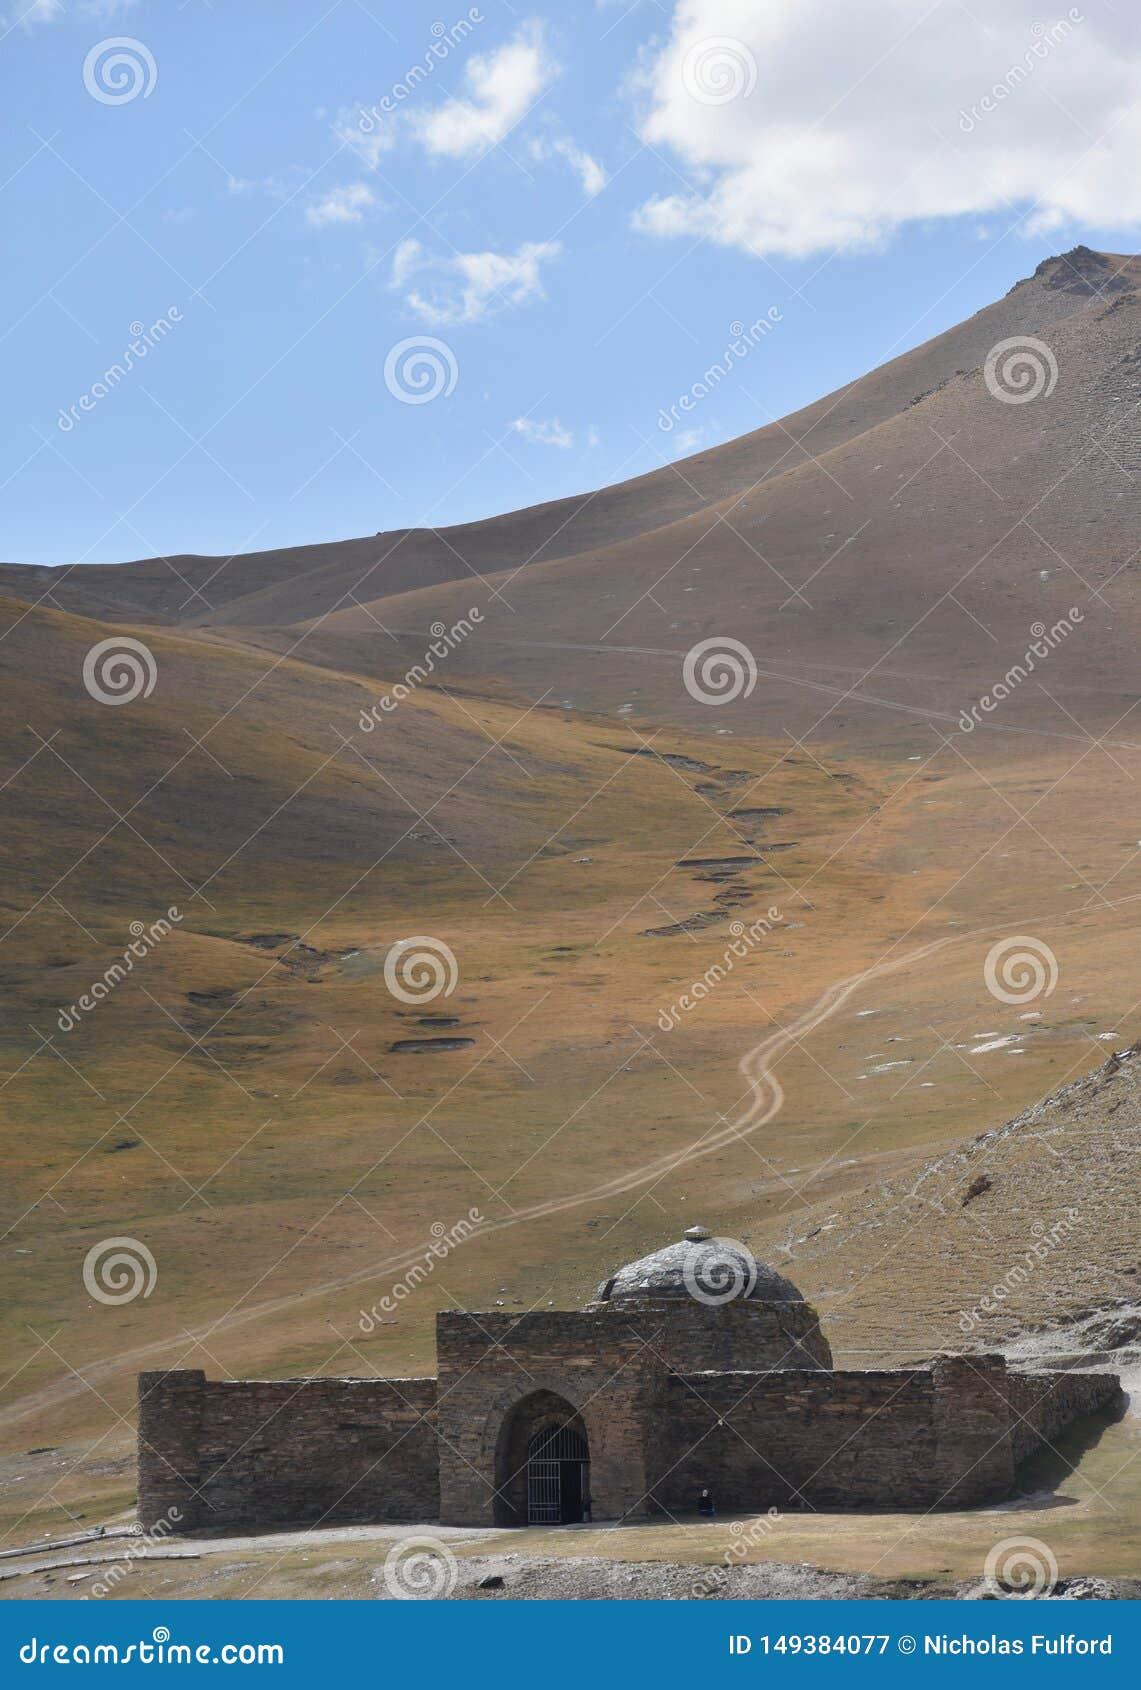 Tash Рабат Caravanseri в Кыргызстан